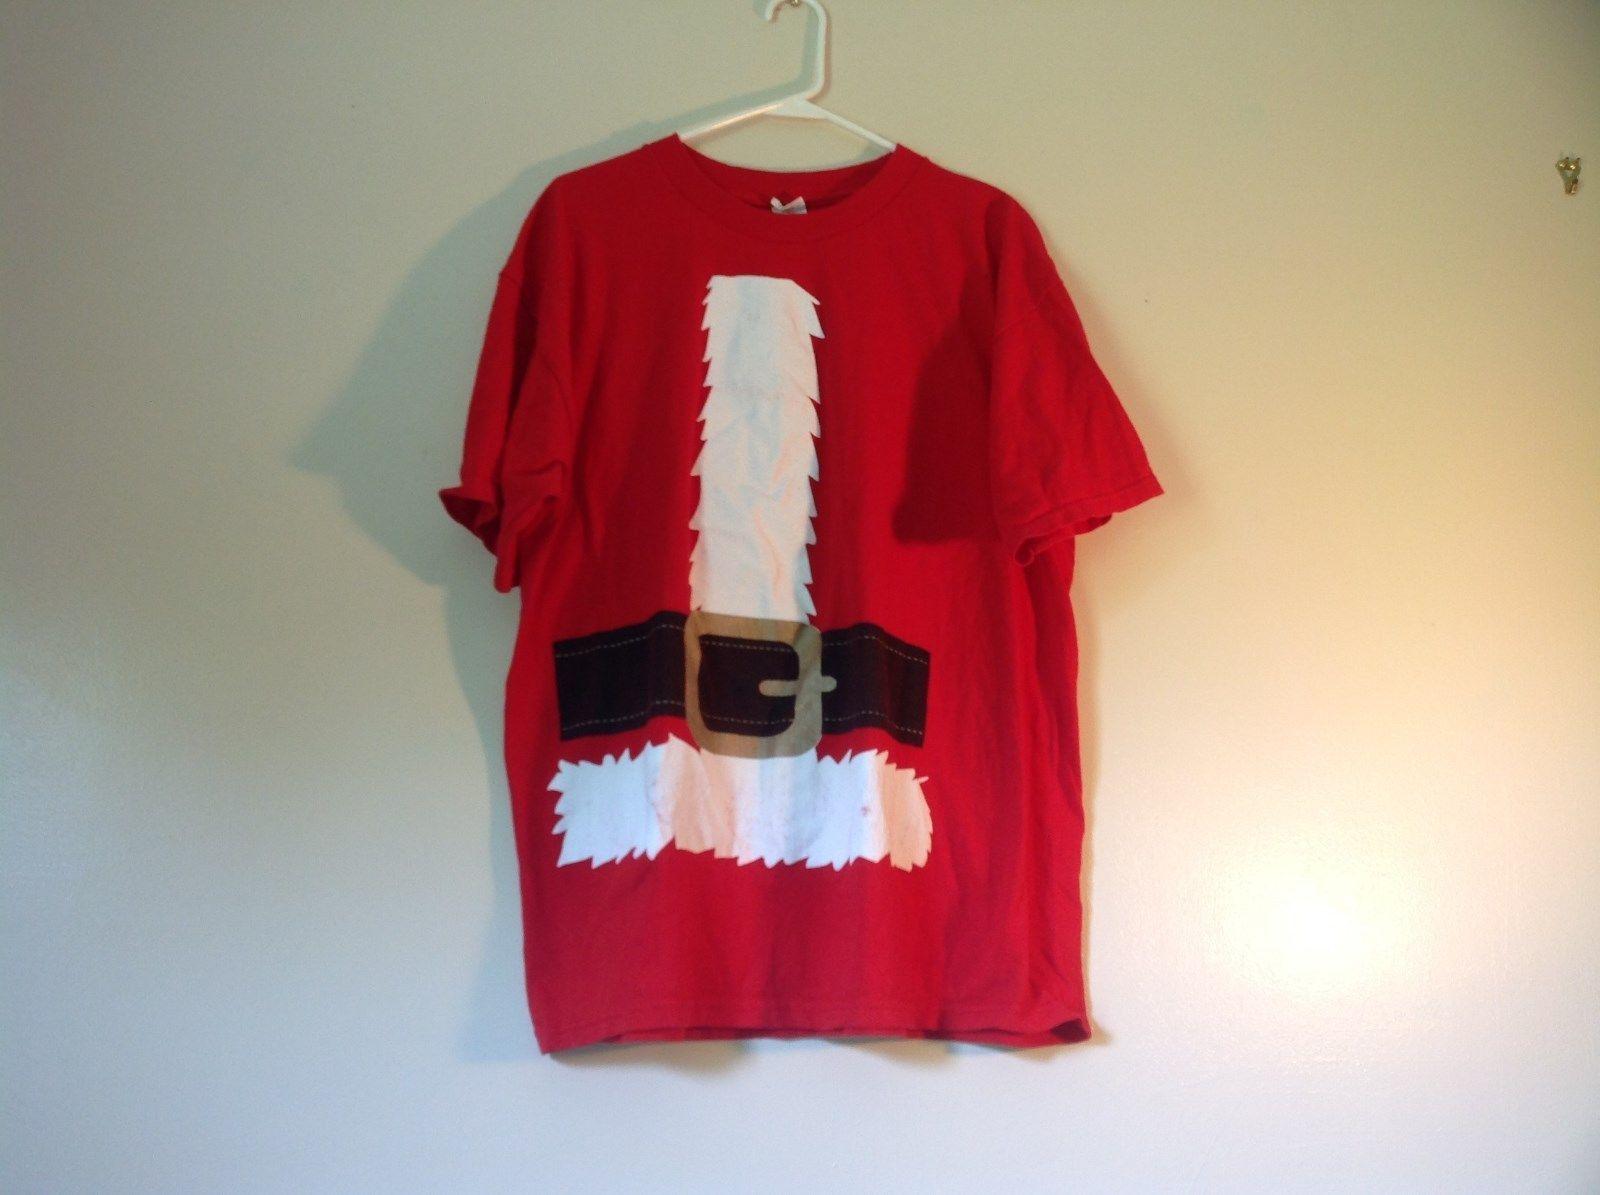 Red Santa Claus Short Sleeve 100 Percent Cotton Size XL T Shirt Alstyle Apparel